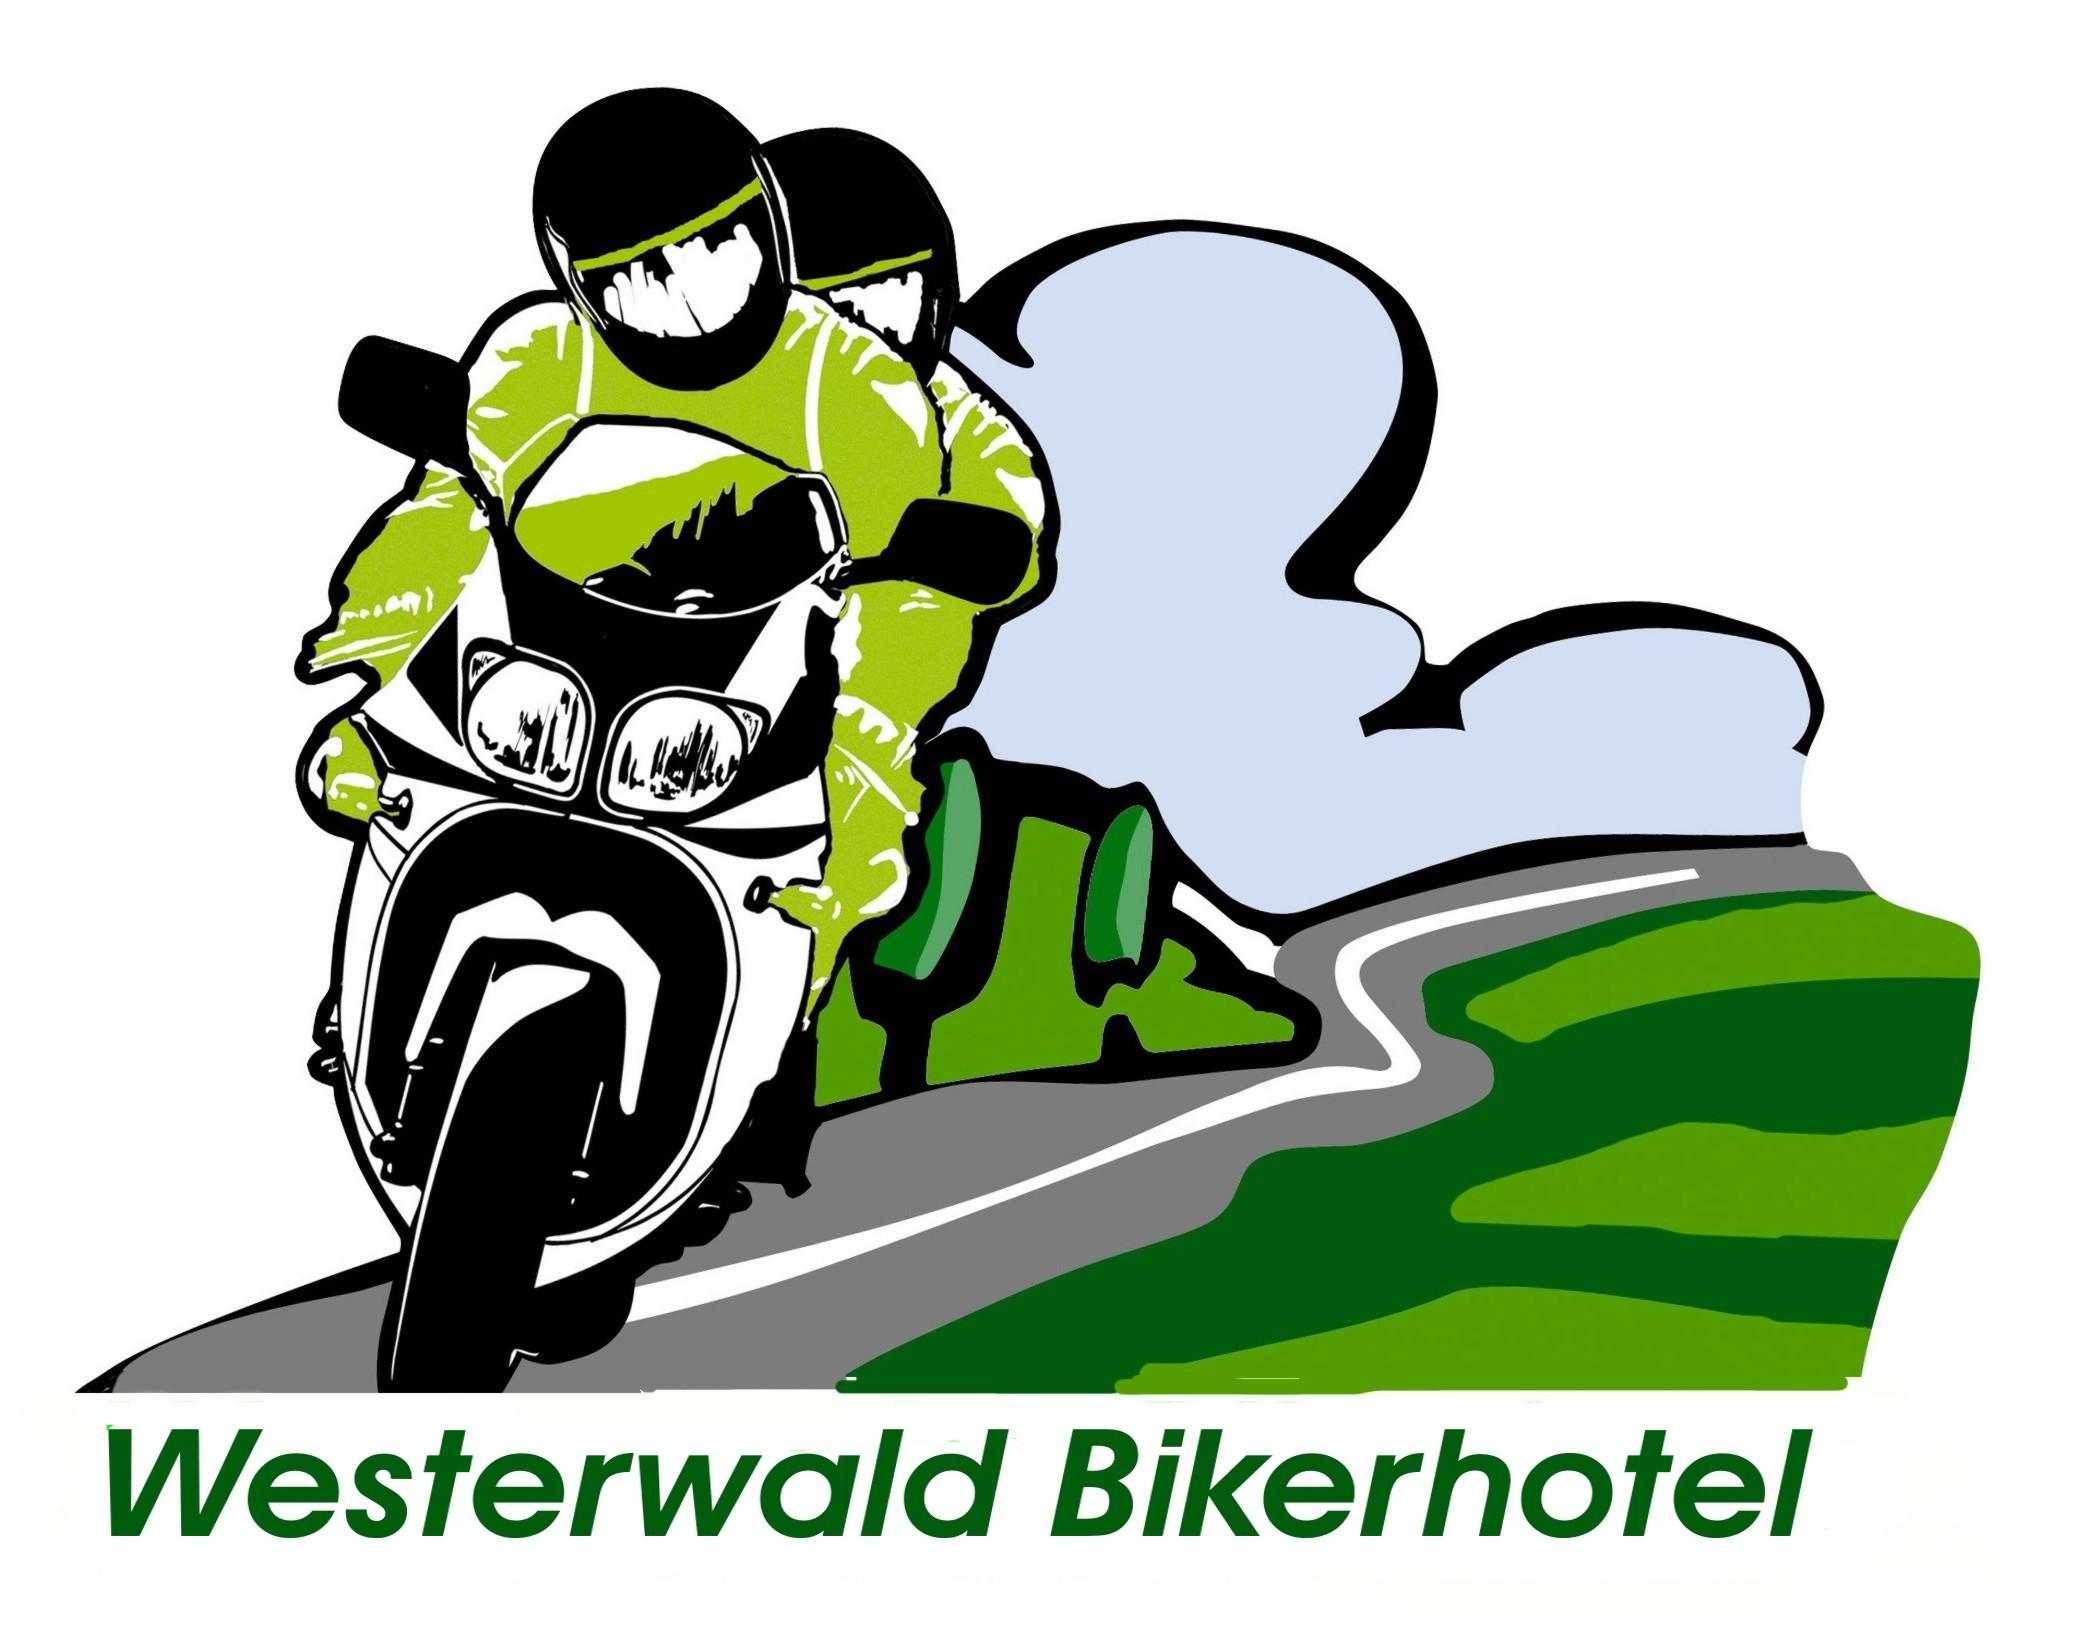 Westerwald-bikerhotel